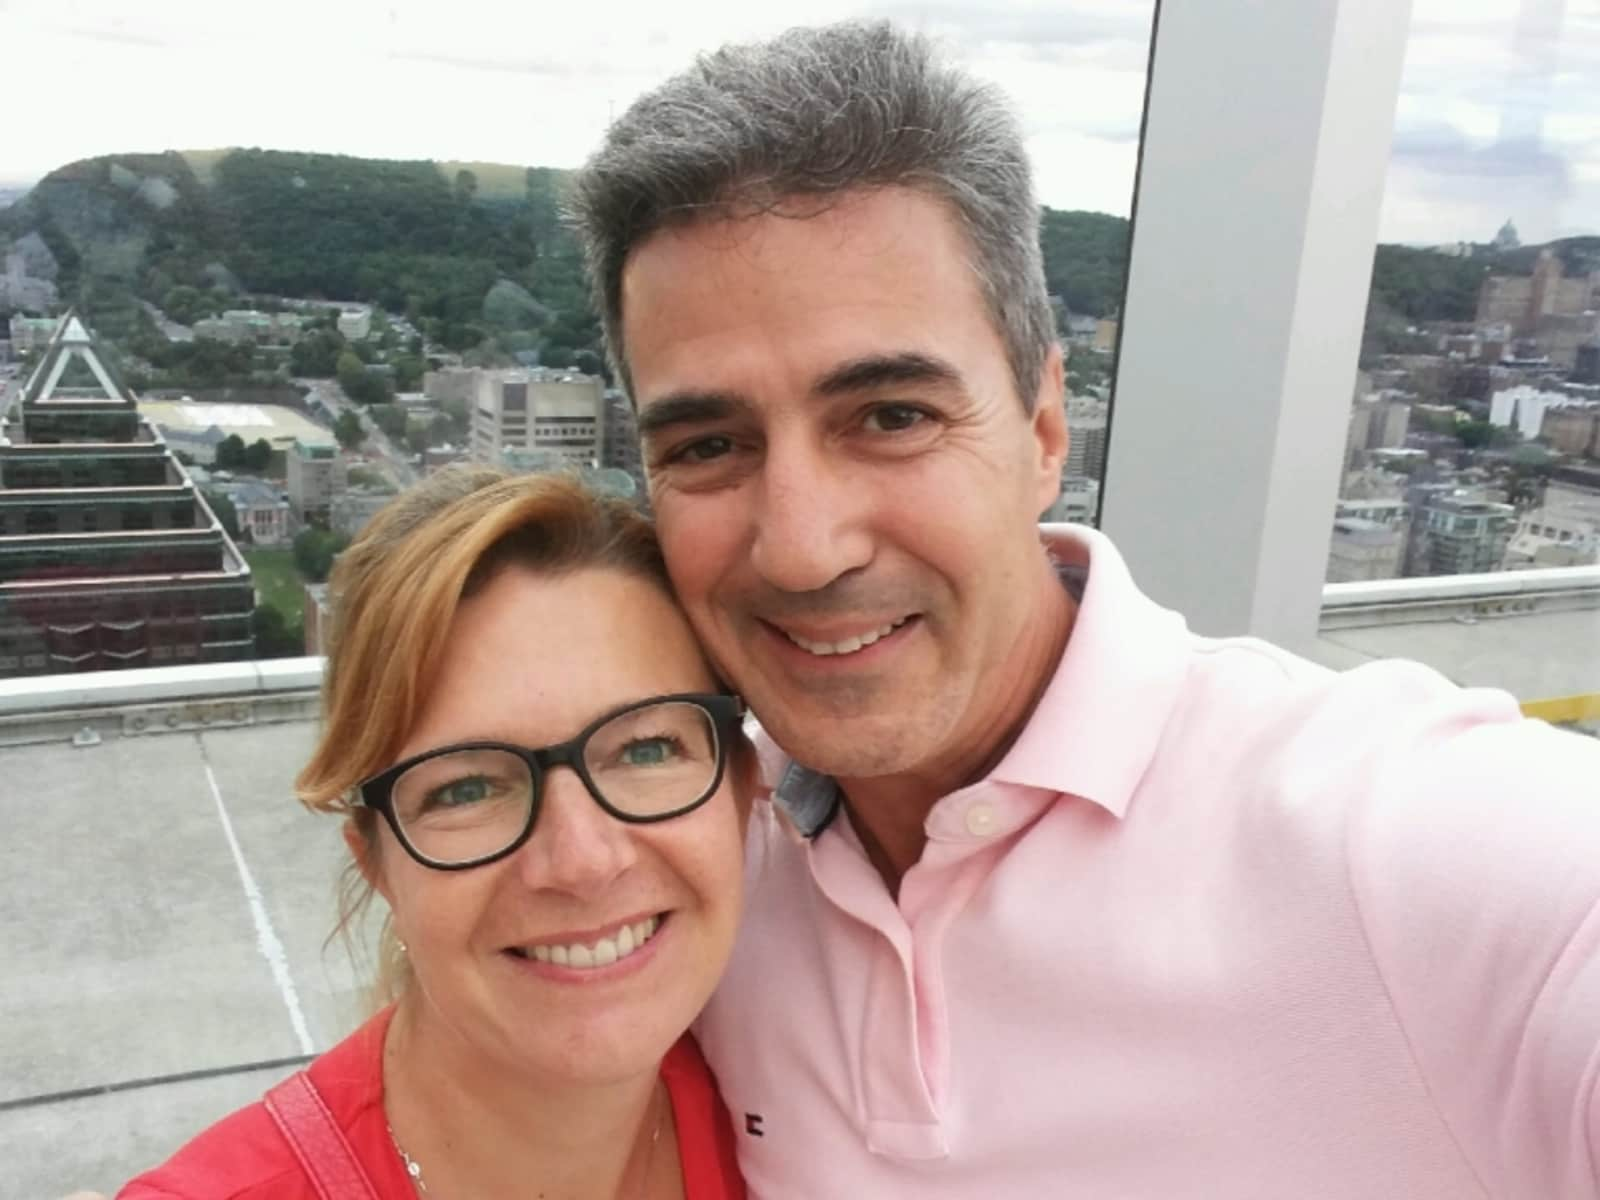 René & Sabine from Montréal, Quebec, Canada